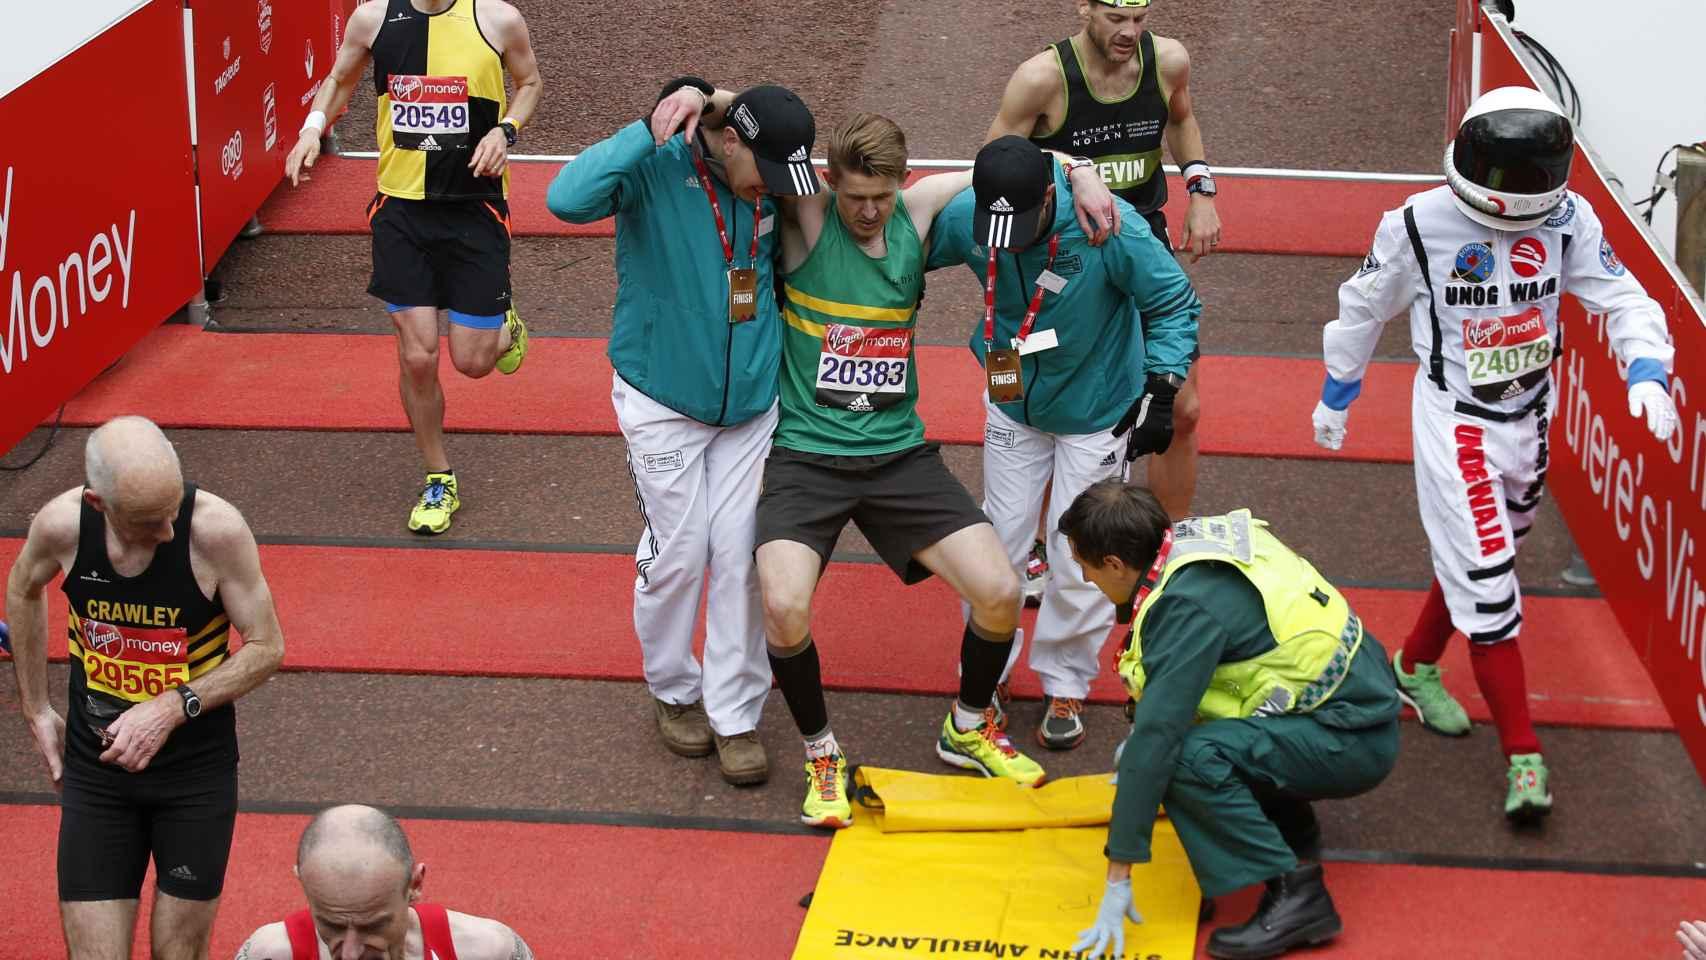 Un corredor en un maratón recibe asistencia médica.